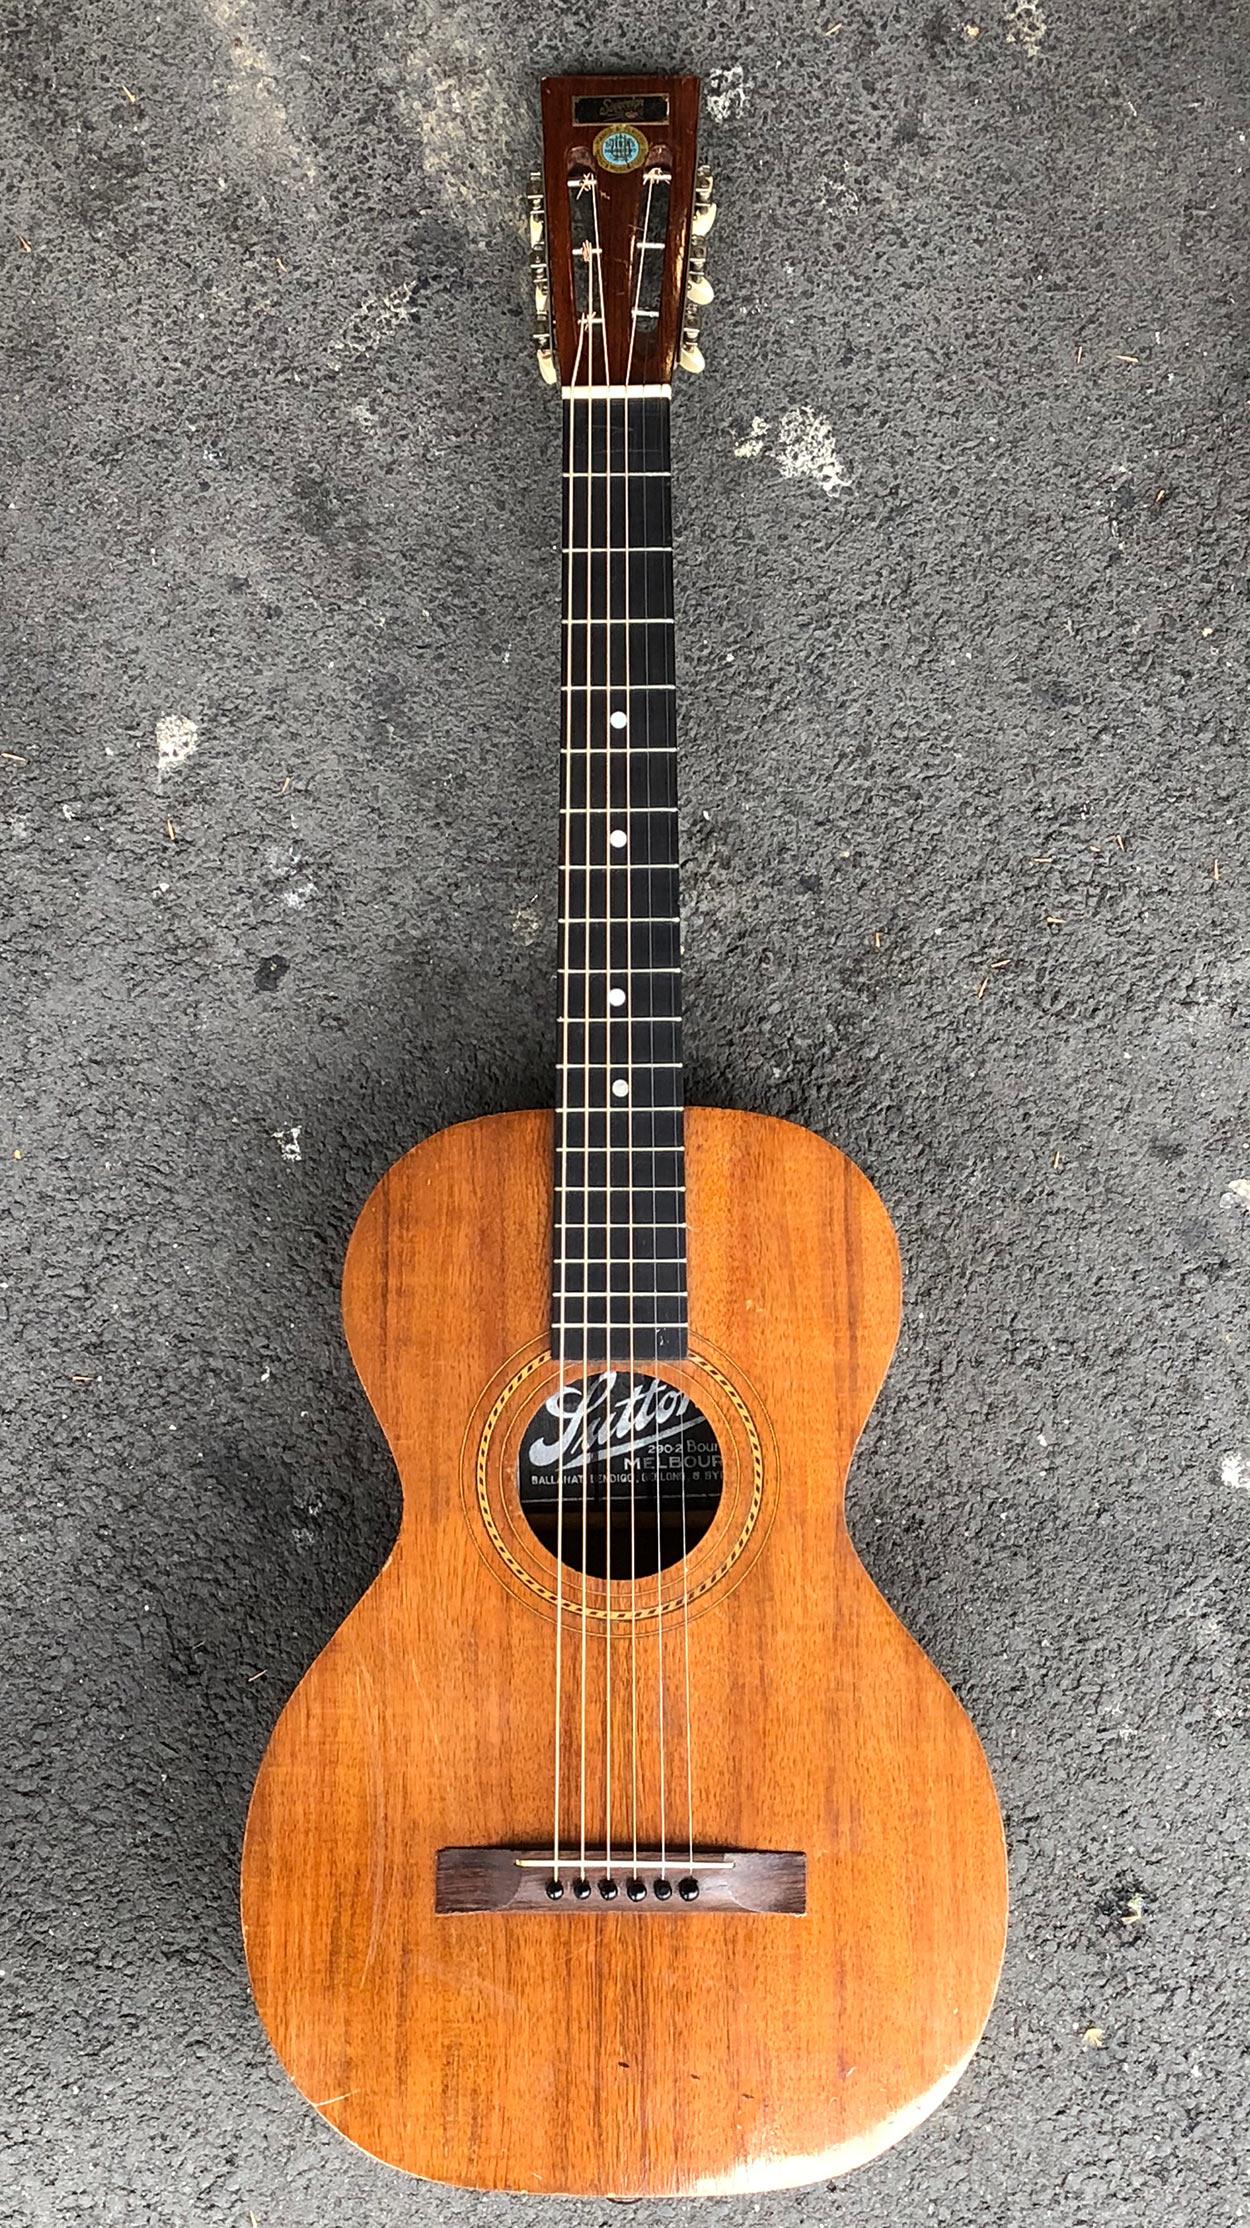 Sovereign Parlour Guitar